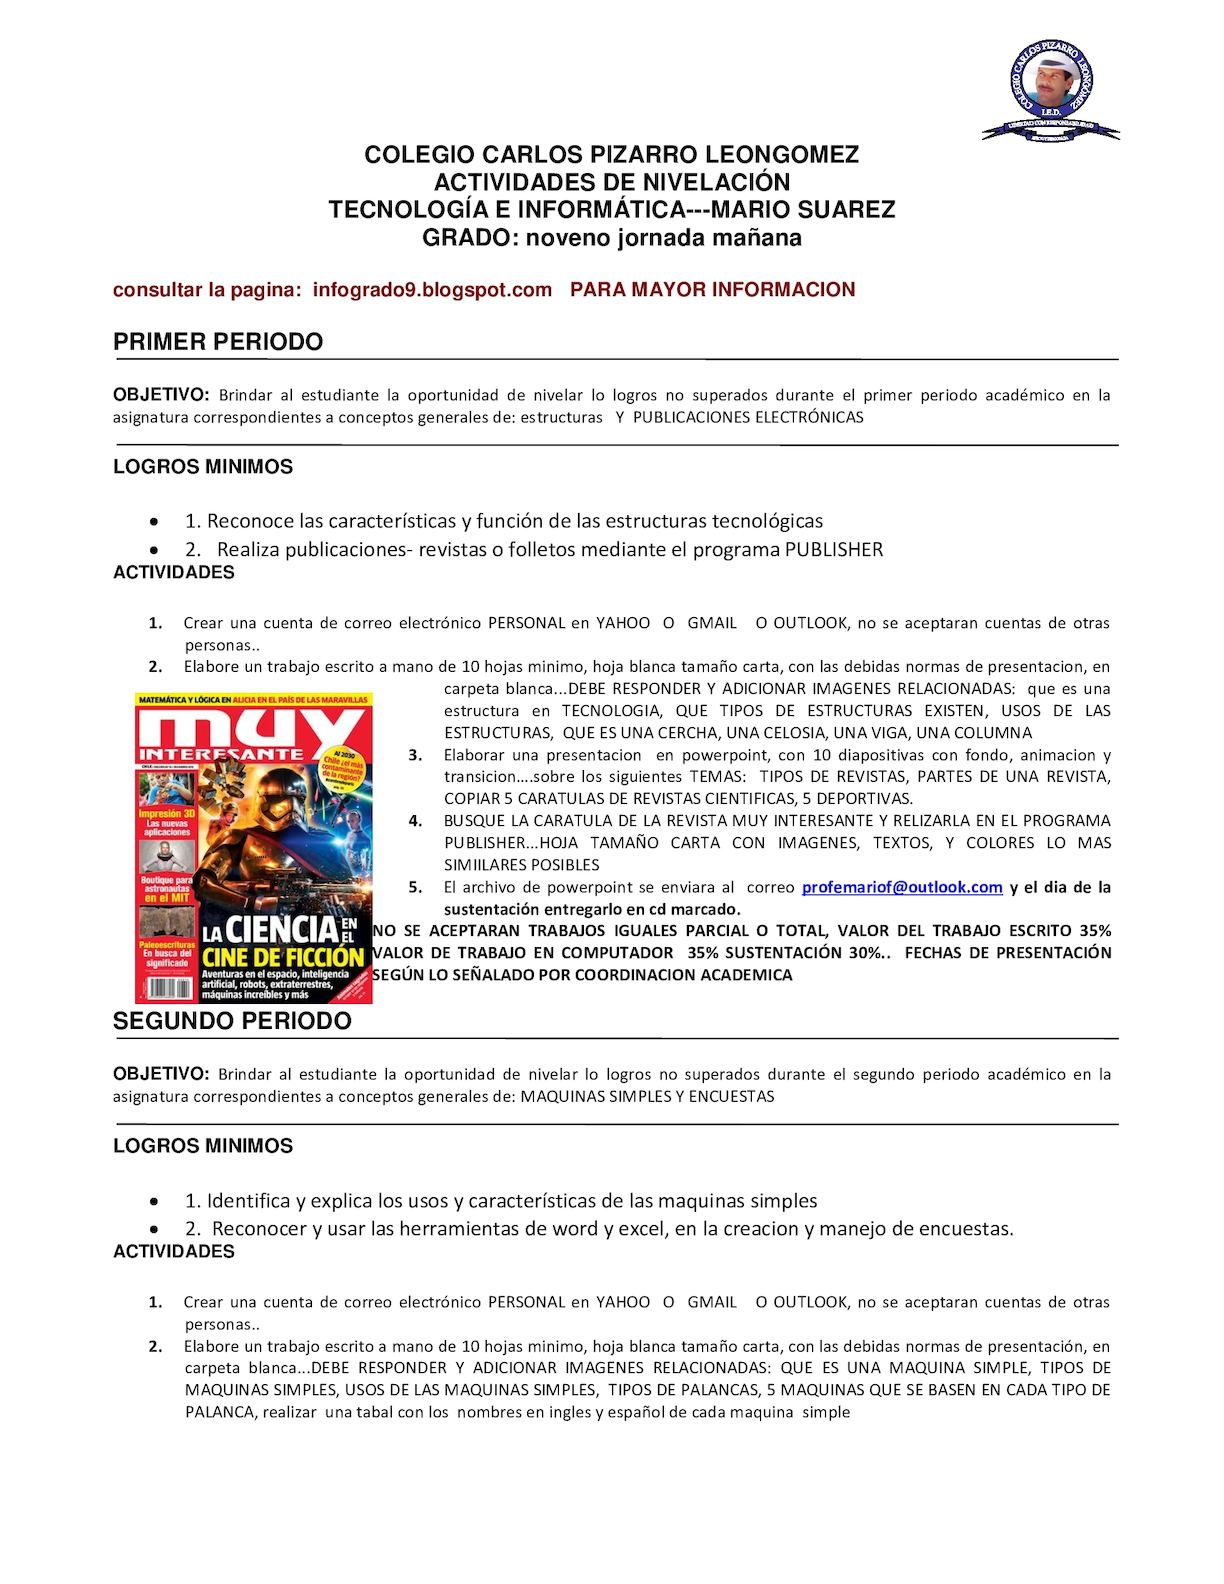 Calaméo - NIVELACIONES TECNOLOGIA E INFORMATICA GRADO 9